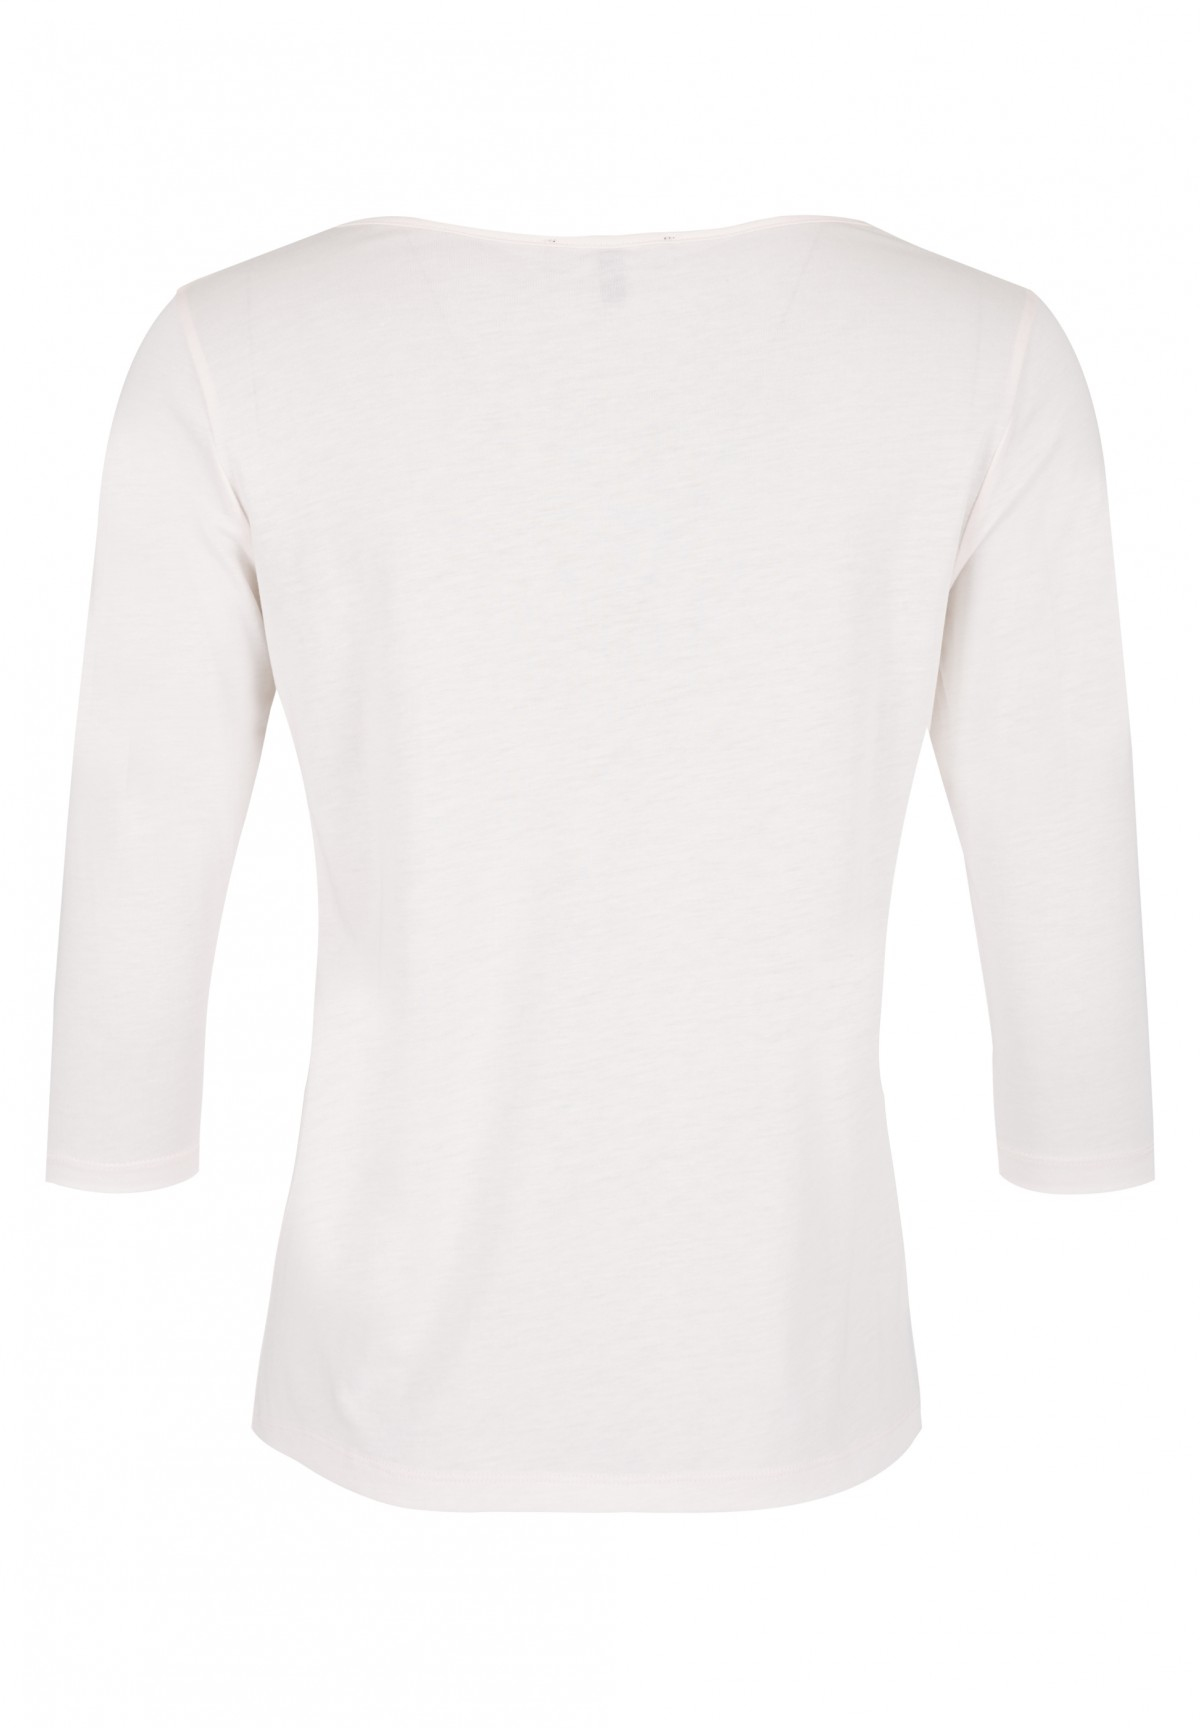 Shirt mit raffiniertem Ausschnitt / Shirt